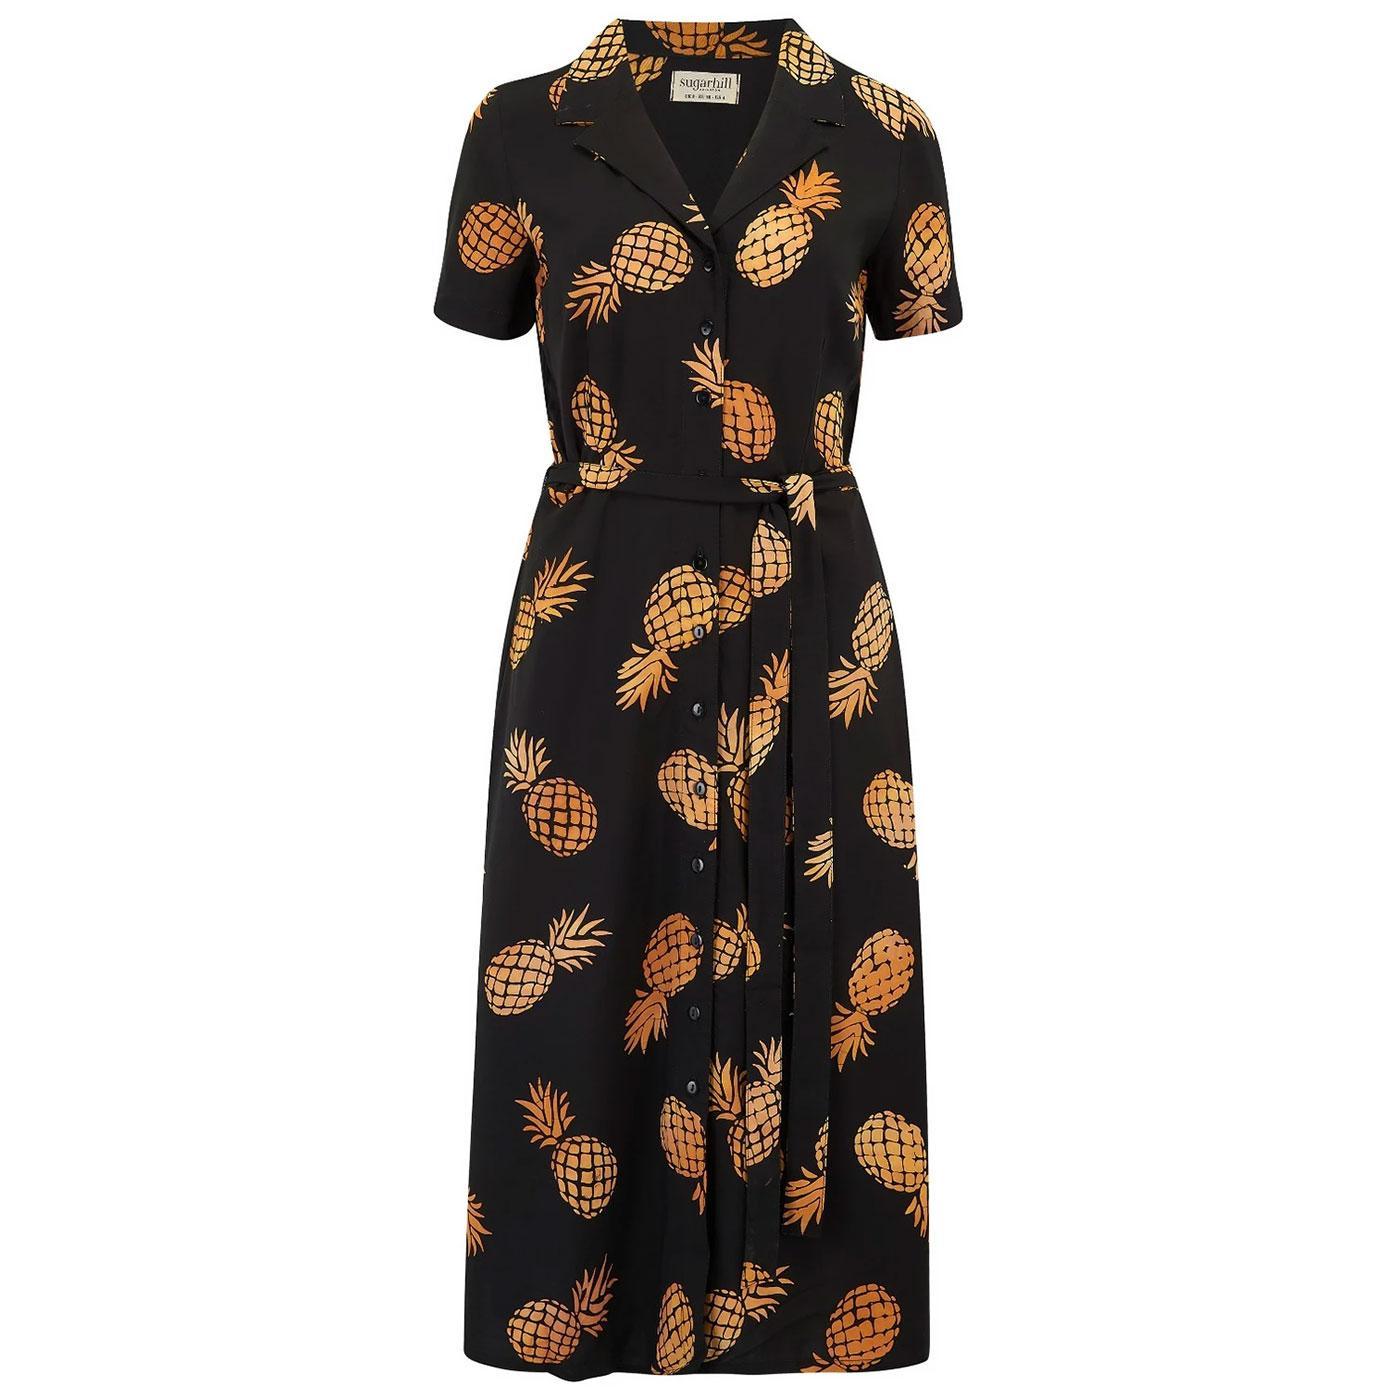 Kendra SUGARHILL Pineapple Batik Retro Shirt Dress